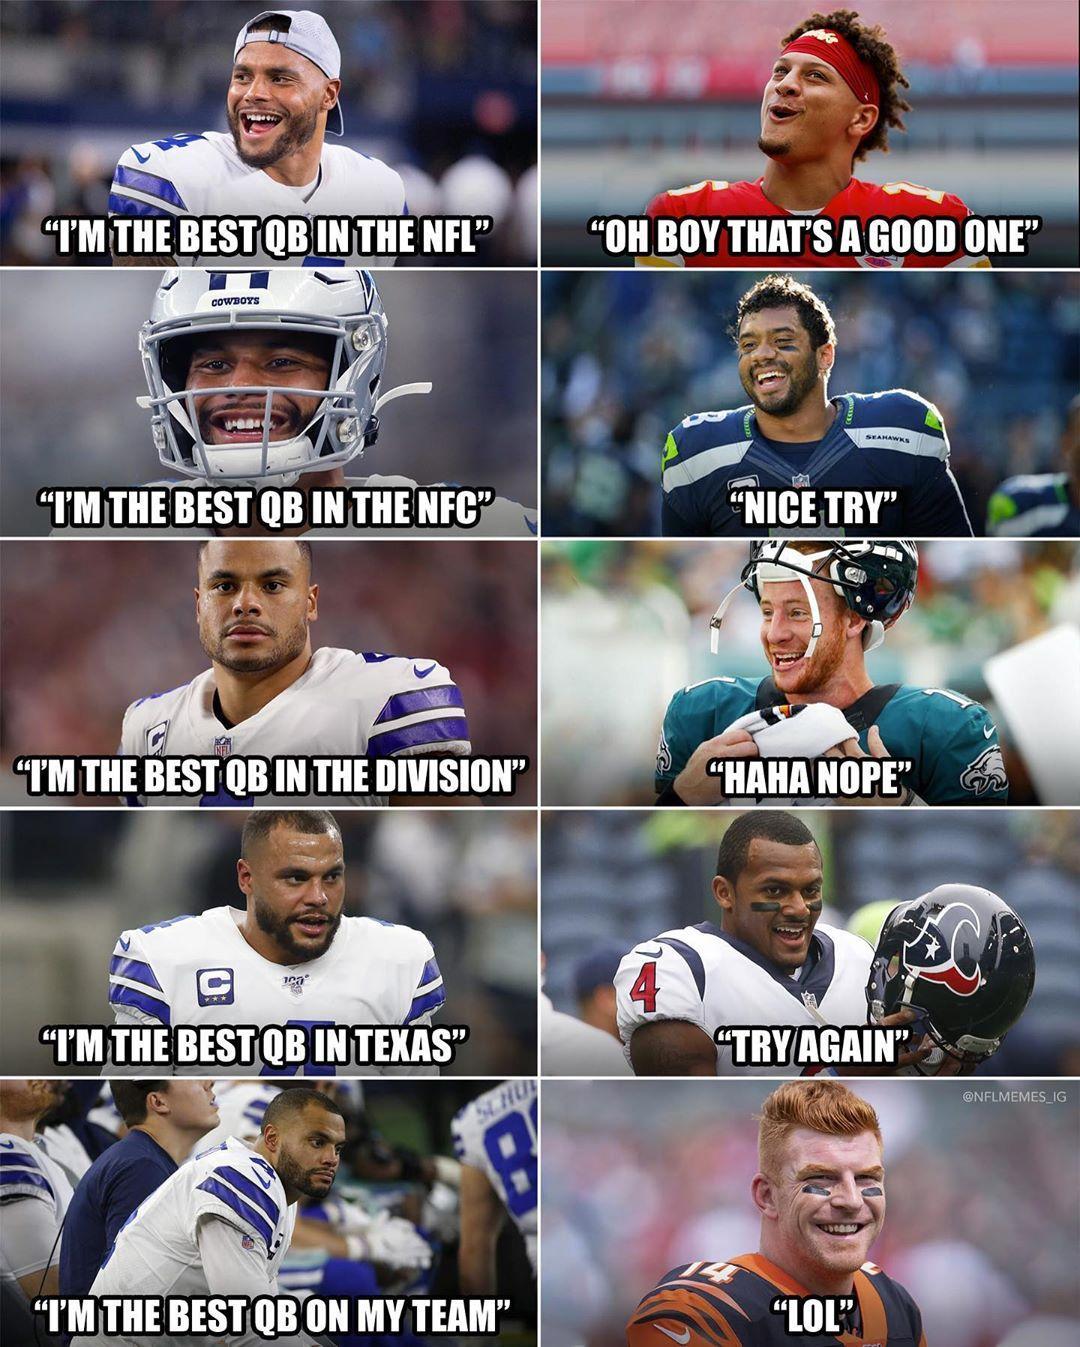 Nfl Memes On Instagram Dak Nflol Ig Nfl Memes Funny Funny Football Memes Nfl Jokes